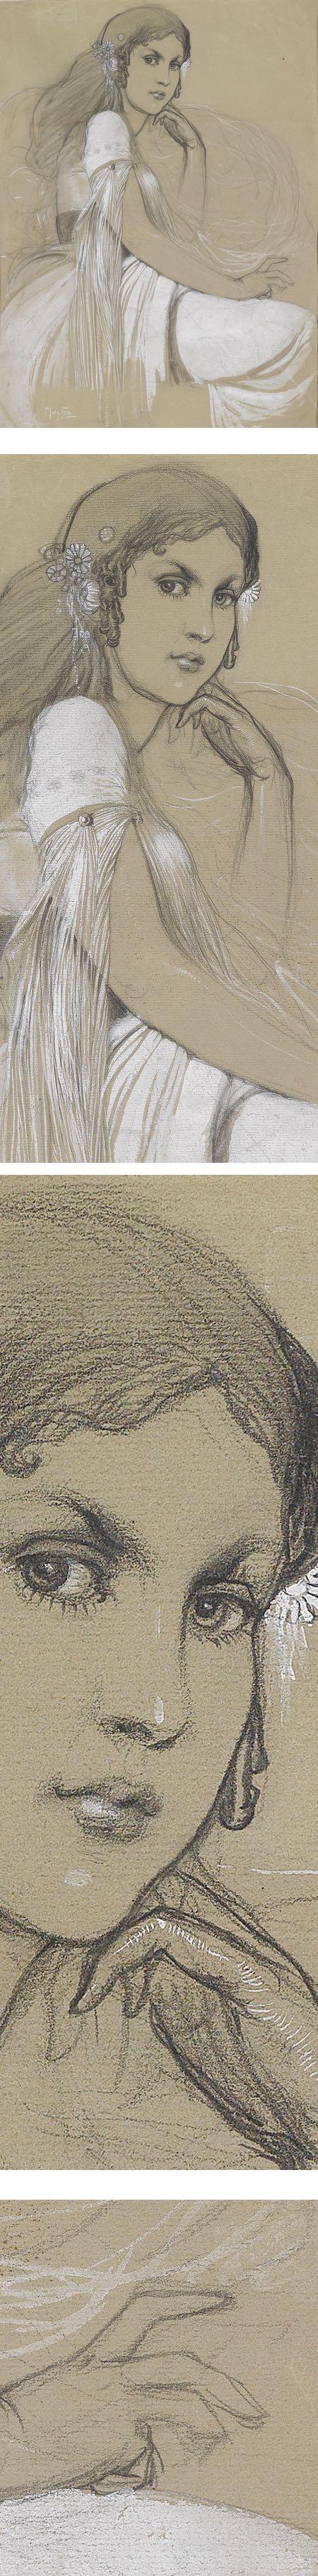 Jaroslava Mucha, pencil portrait drawing by Alfons Mucha